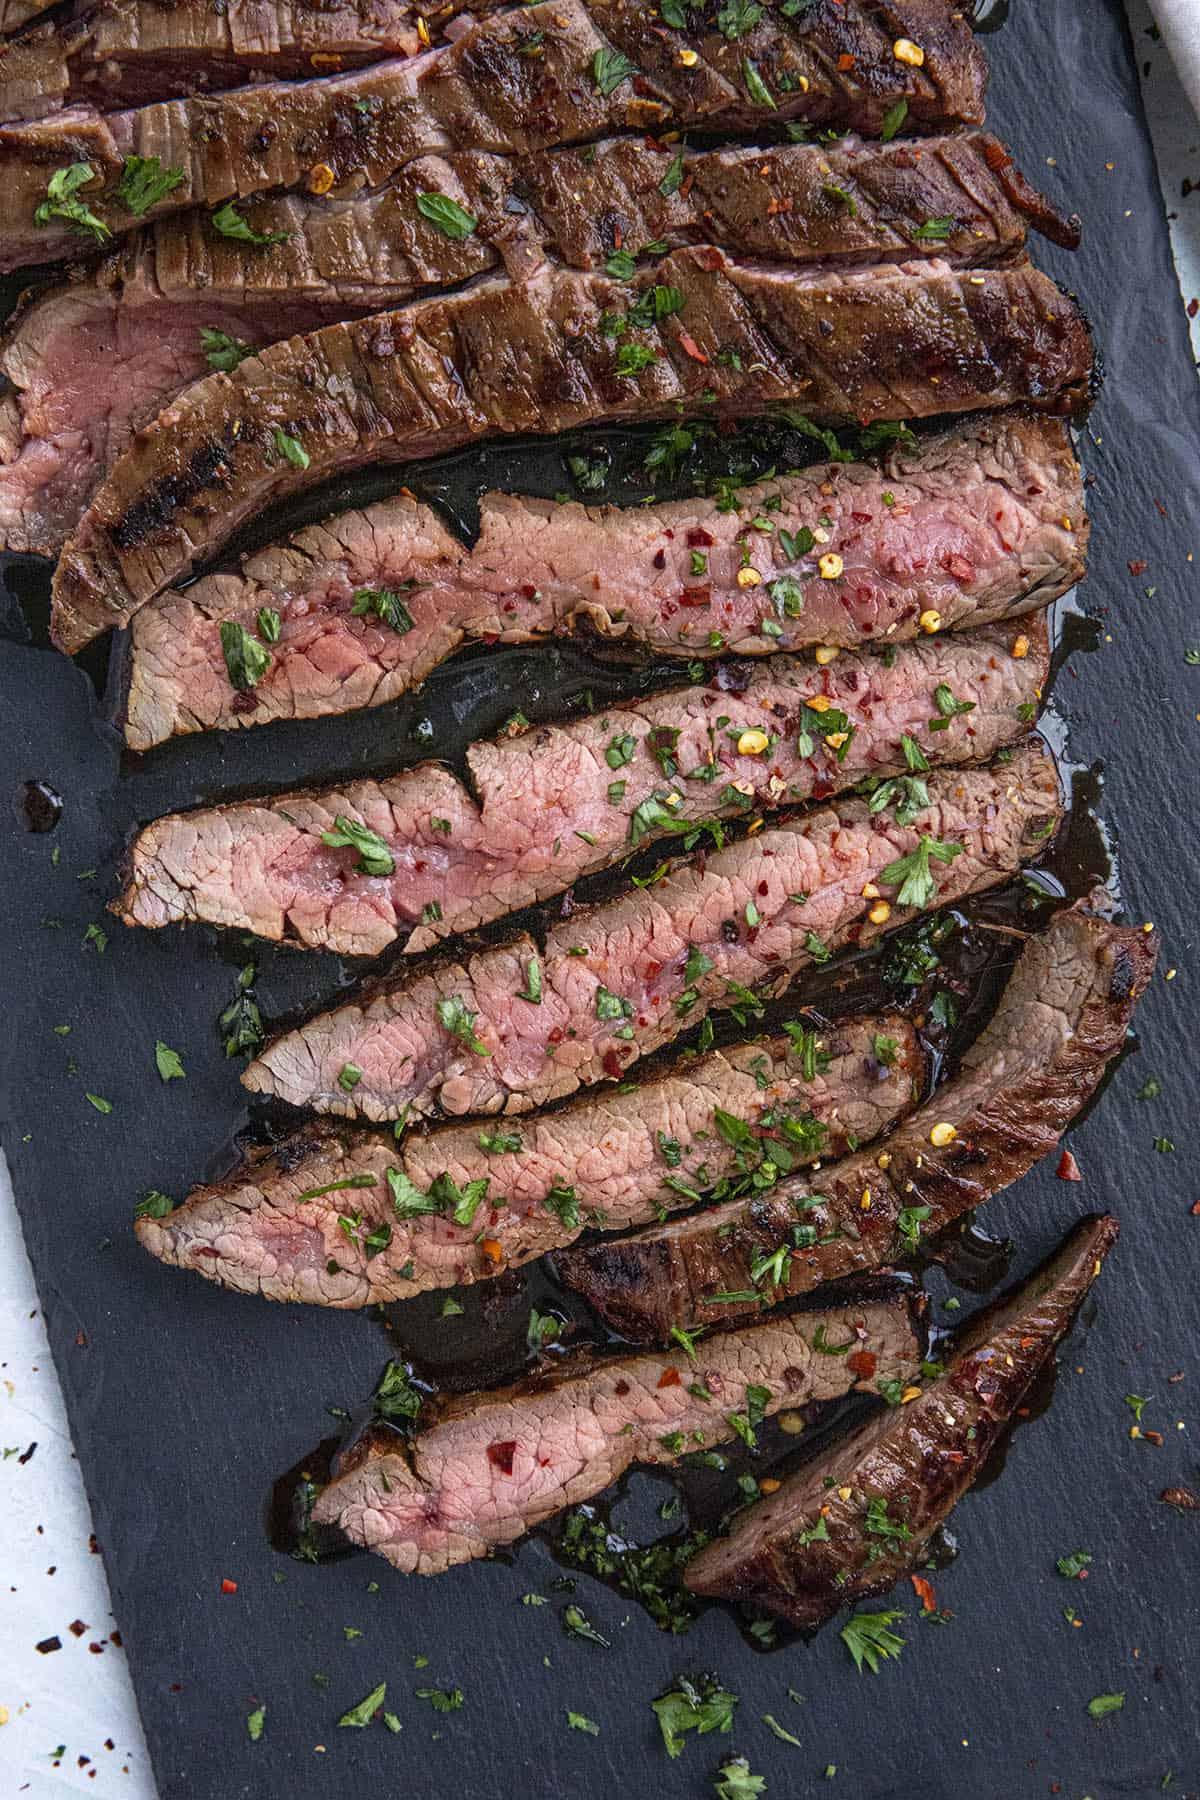 Sliced marinated flank steak ready to serve